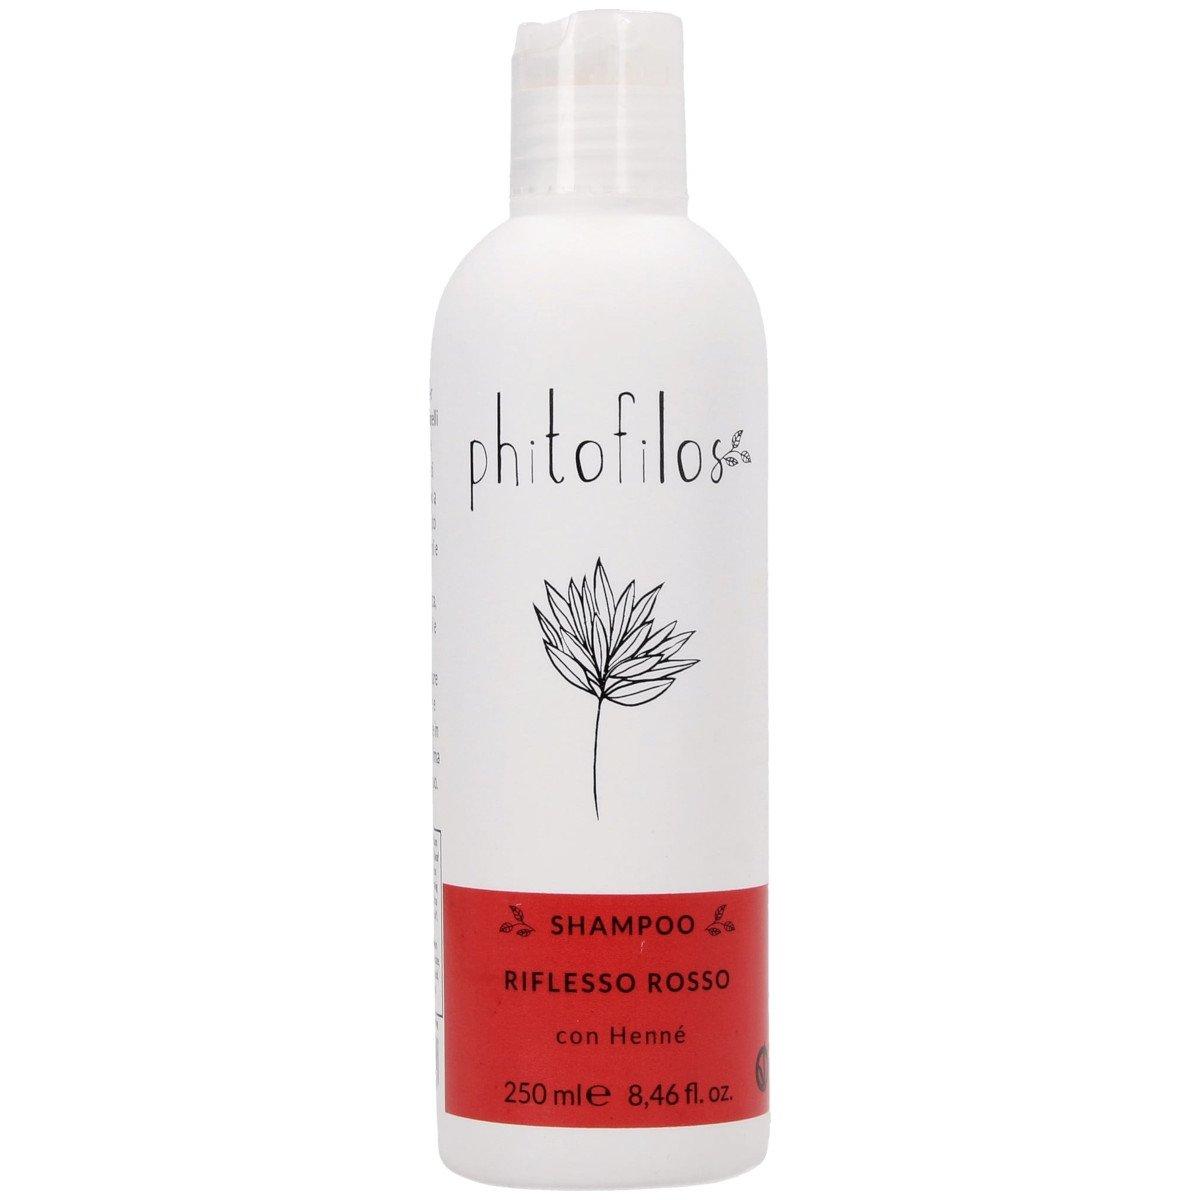 Shampoo Riflesso Rosso con Hennè Bio Vegan